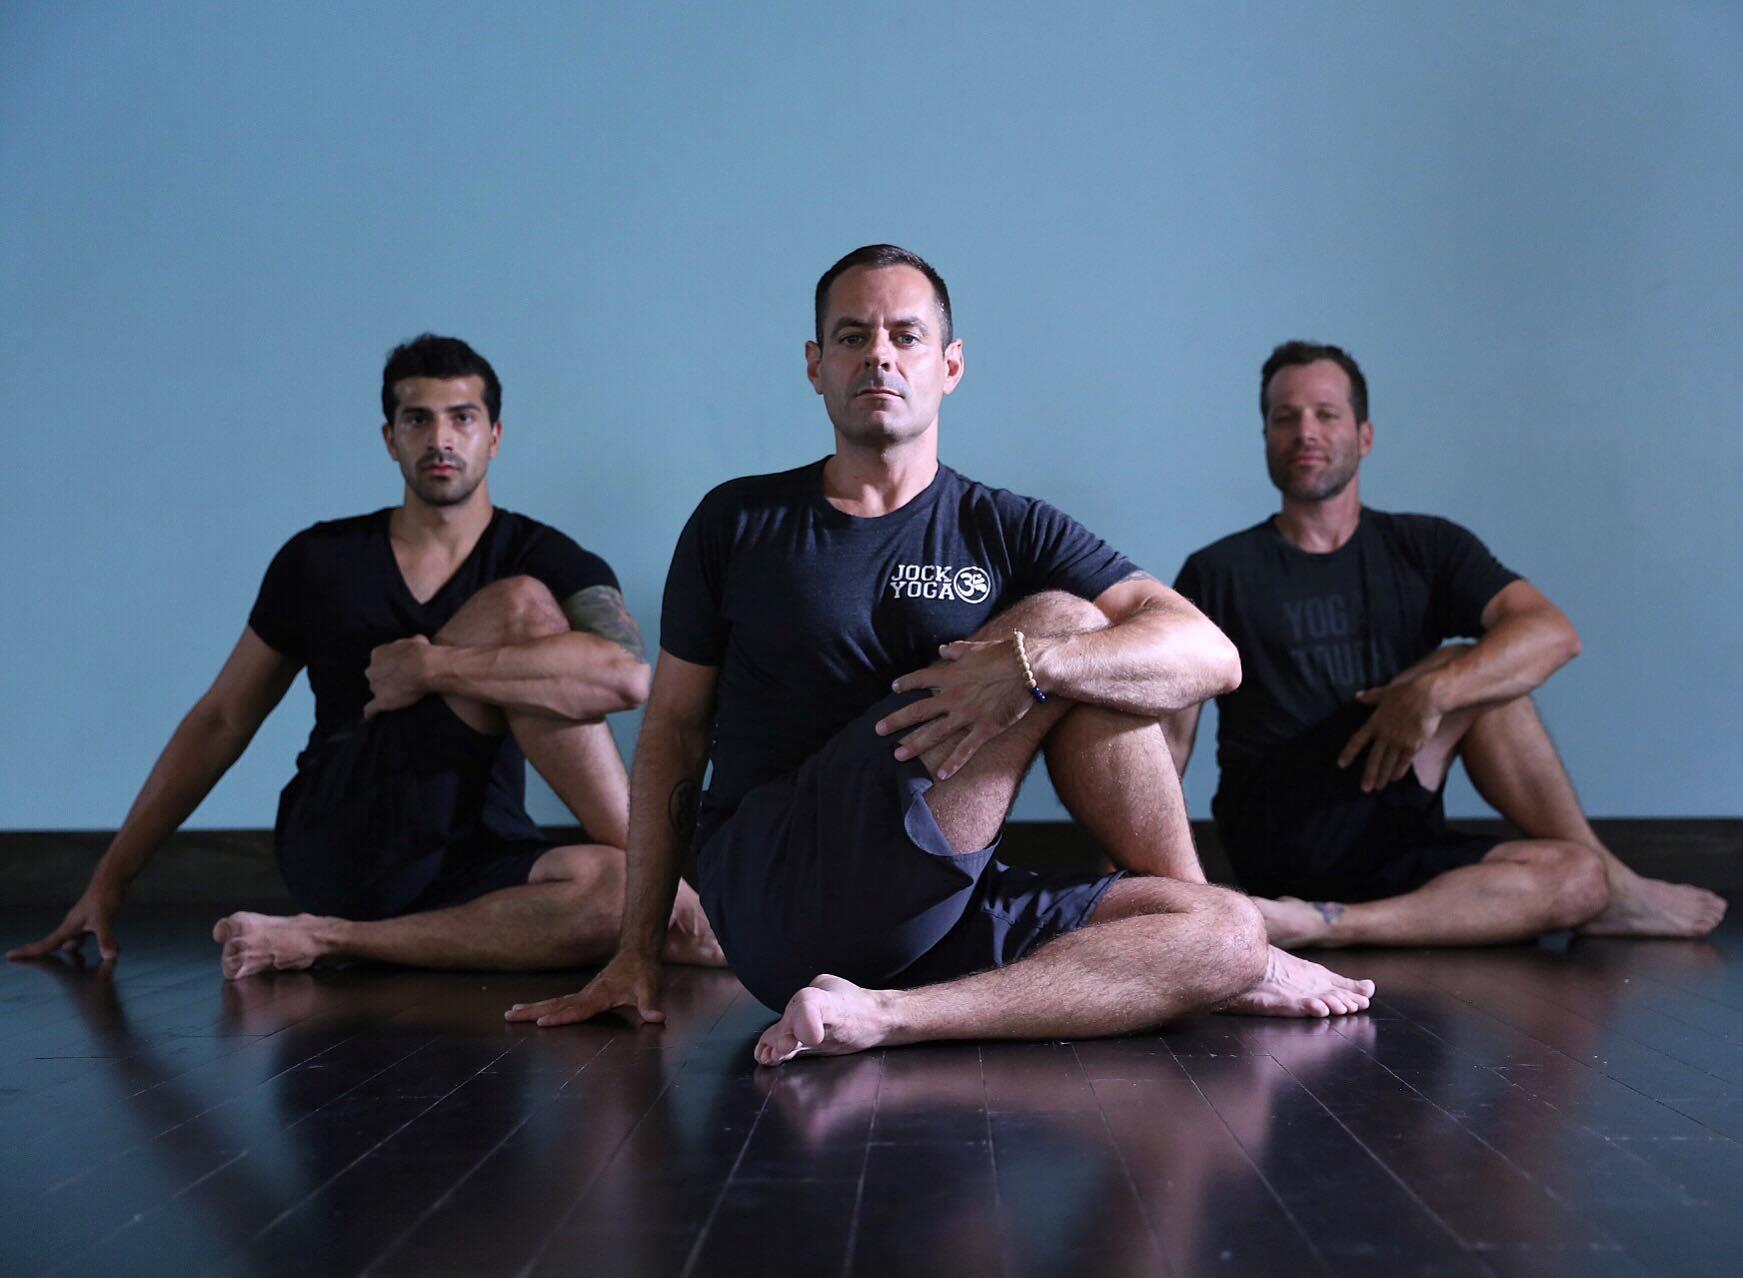 "ys Michael DeCorte, the Toronto ""man-treprenuer"" behind Jock Yoga. (Facebook photo)"